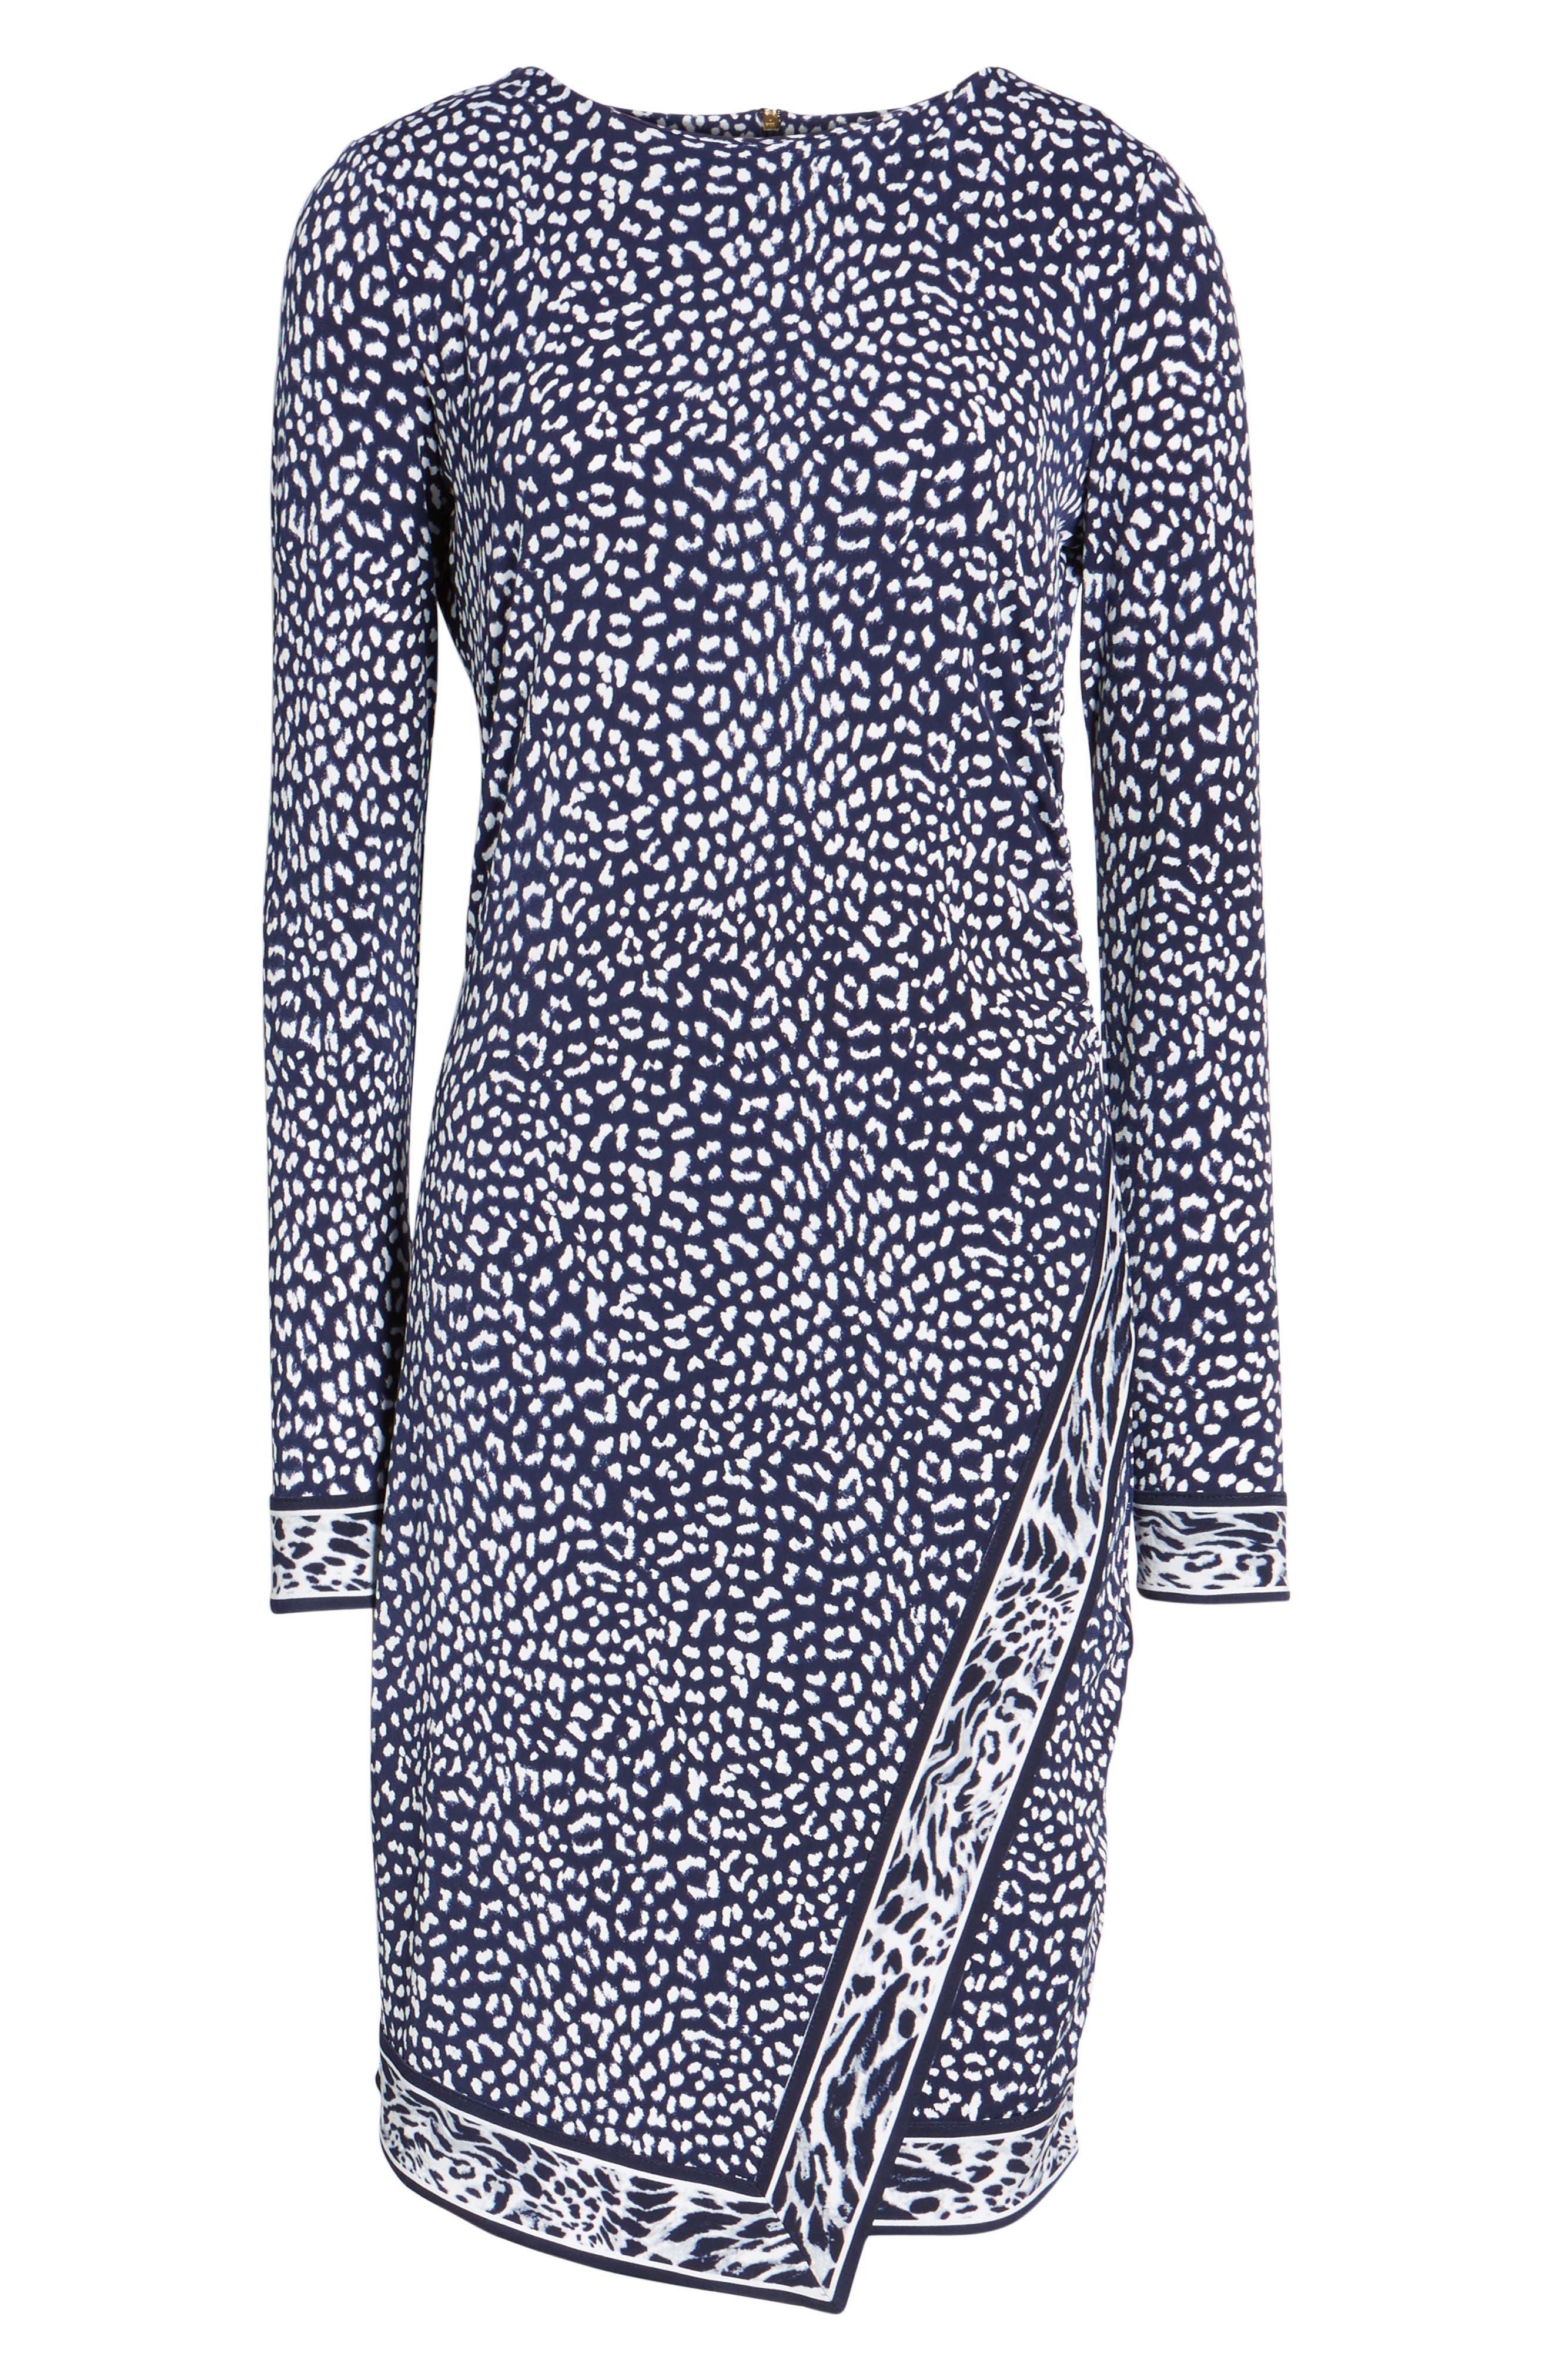 Cheetah Border Print Sheath Dress,                             Alternate thumbnail 6, color,                             456